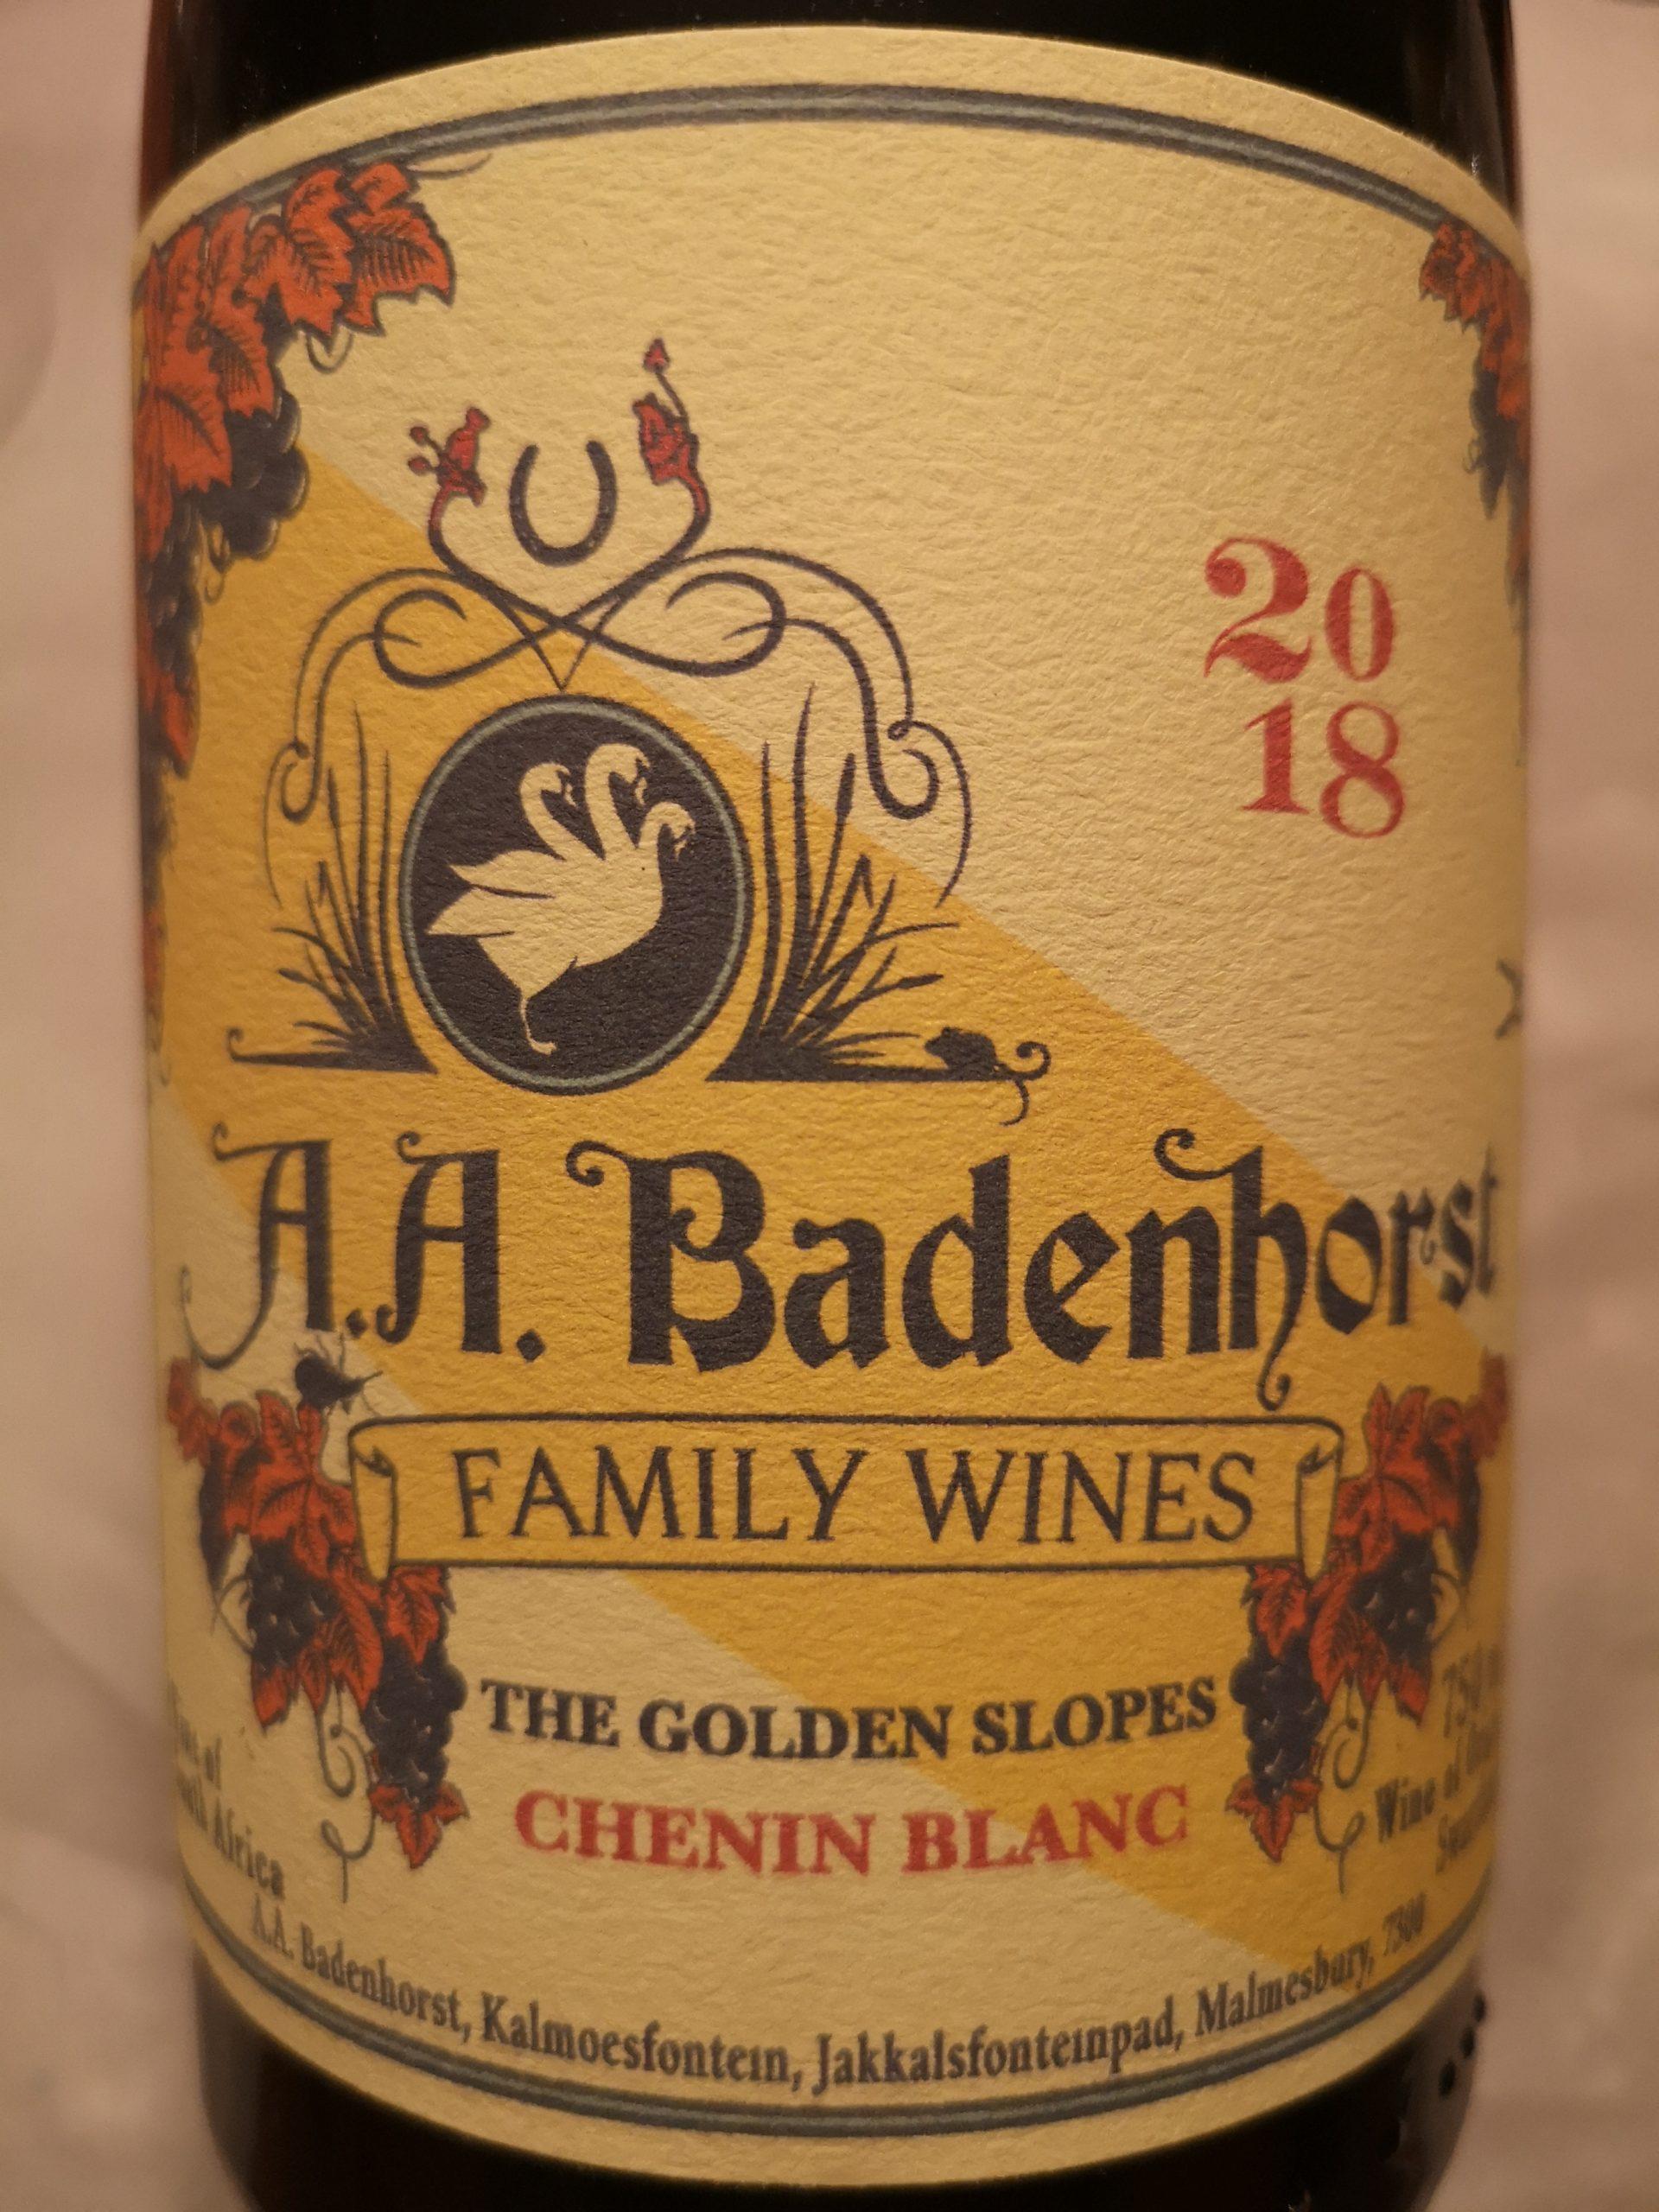 2018 Chenin Blanc Golden Slopes | A.A. Badenhorst